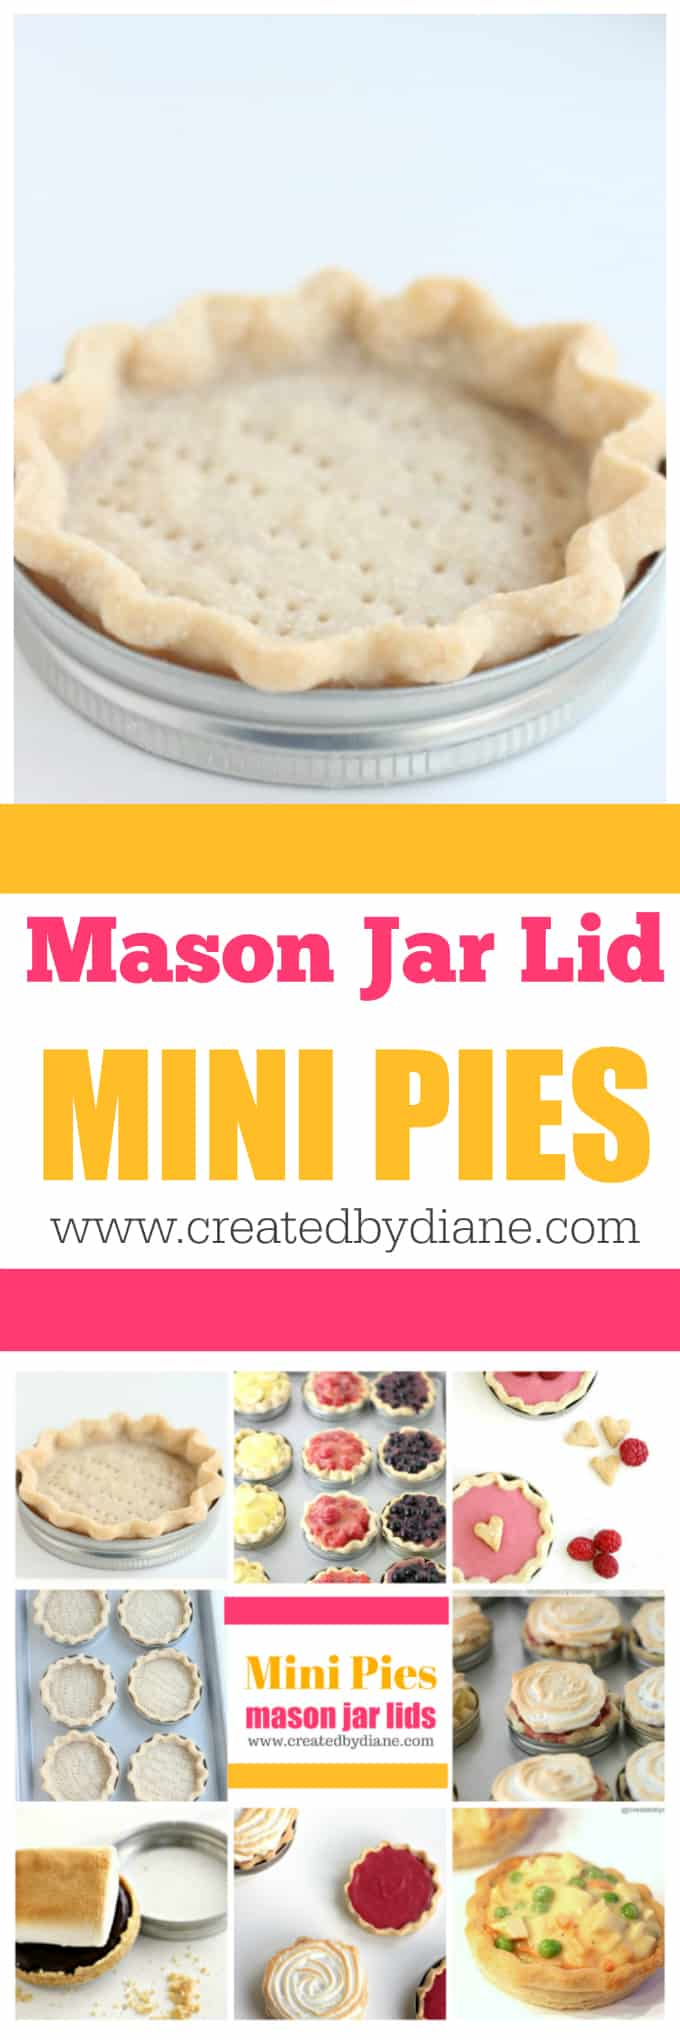 mason jar mini pies www.createdbydiane.com